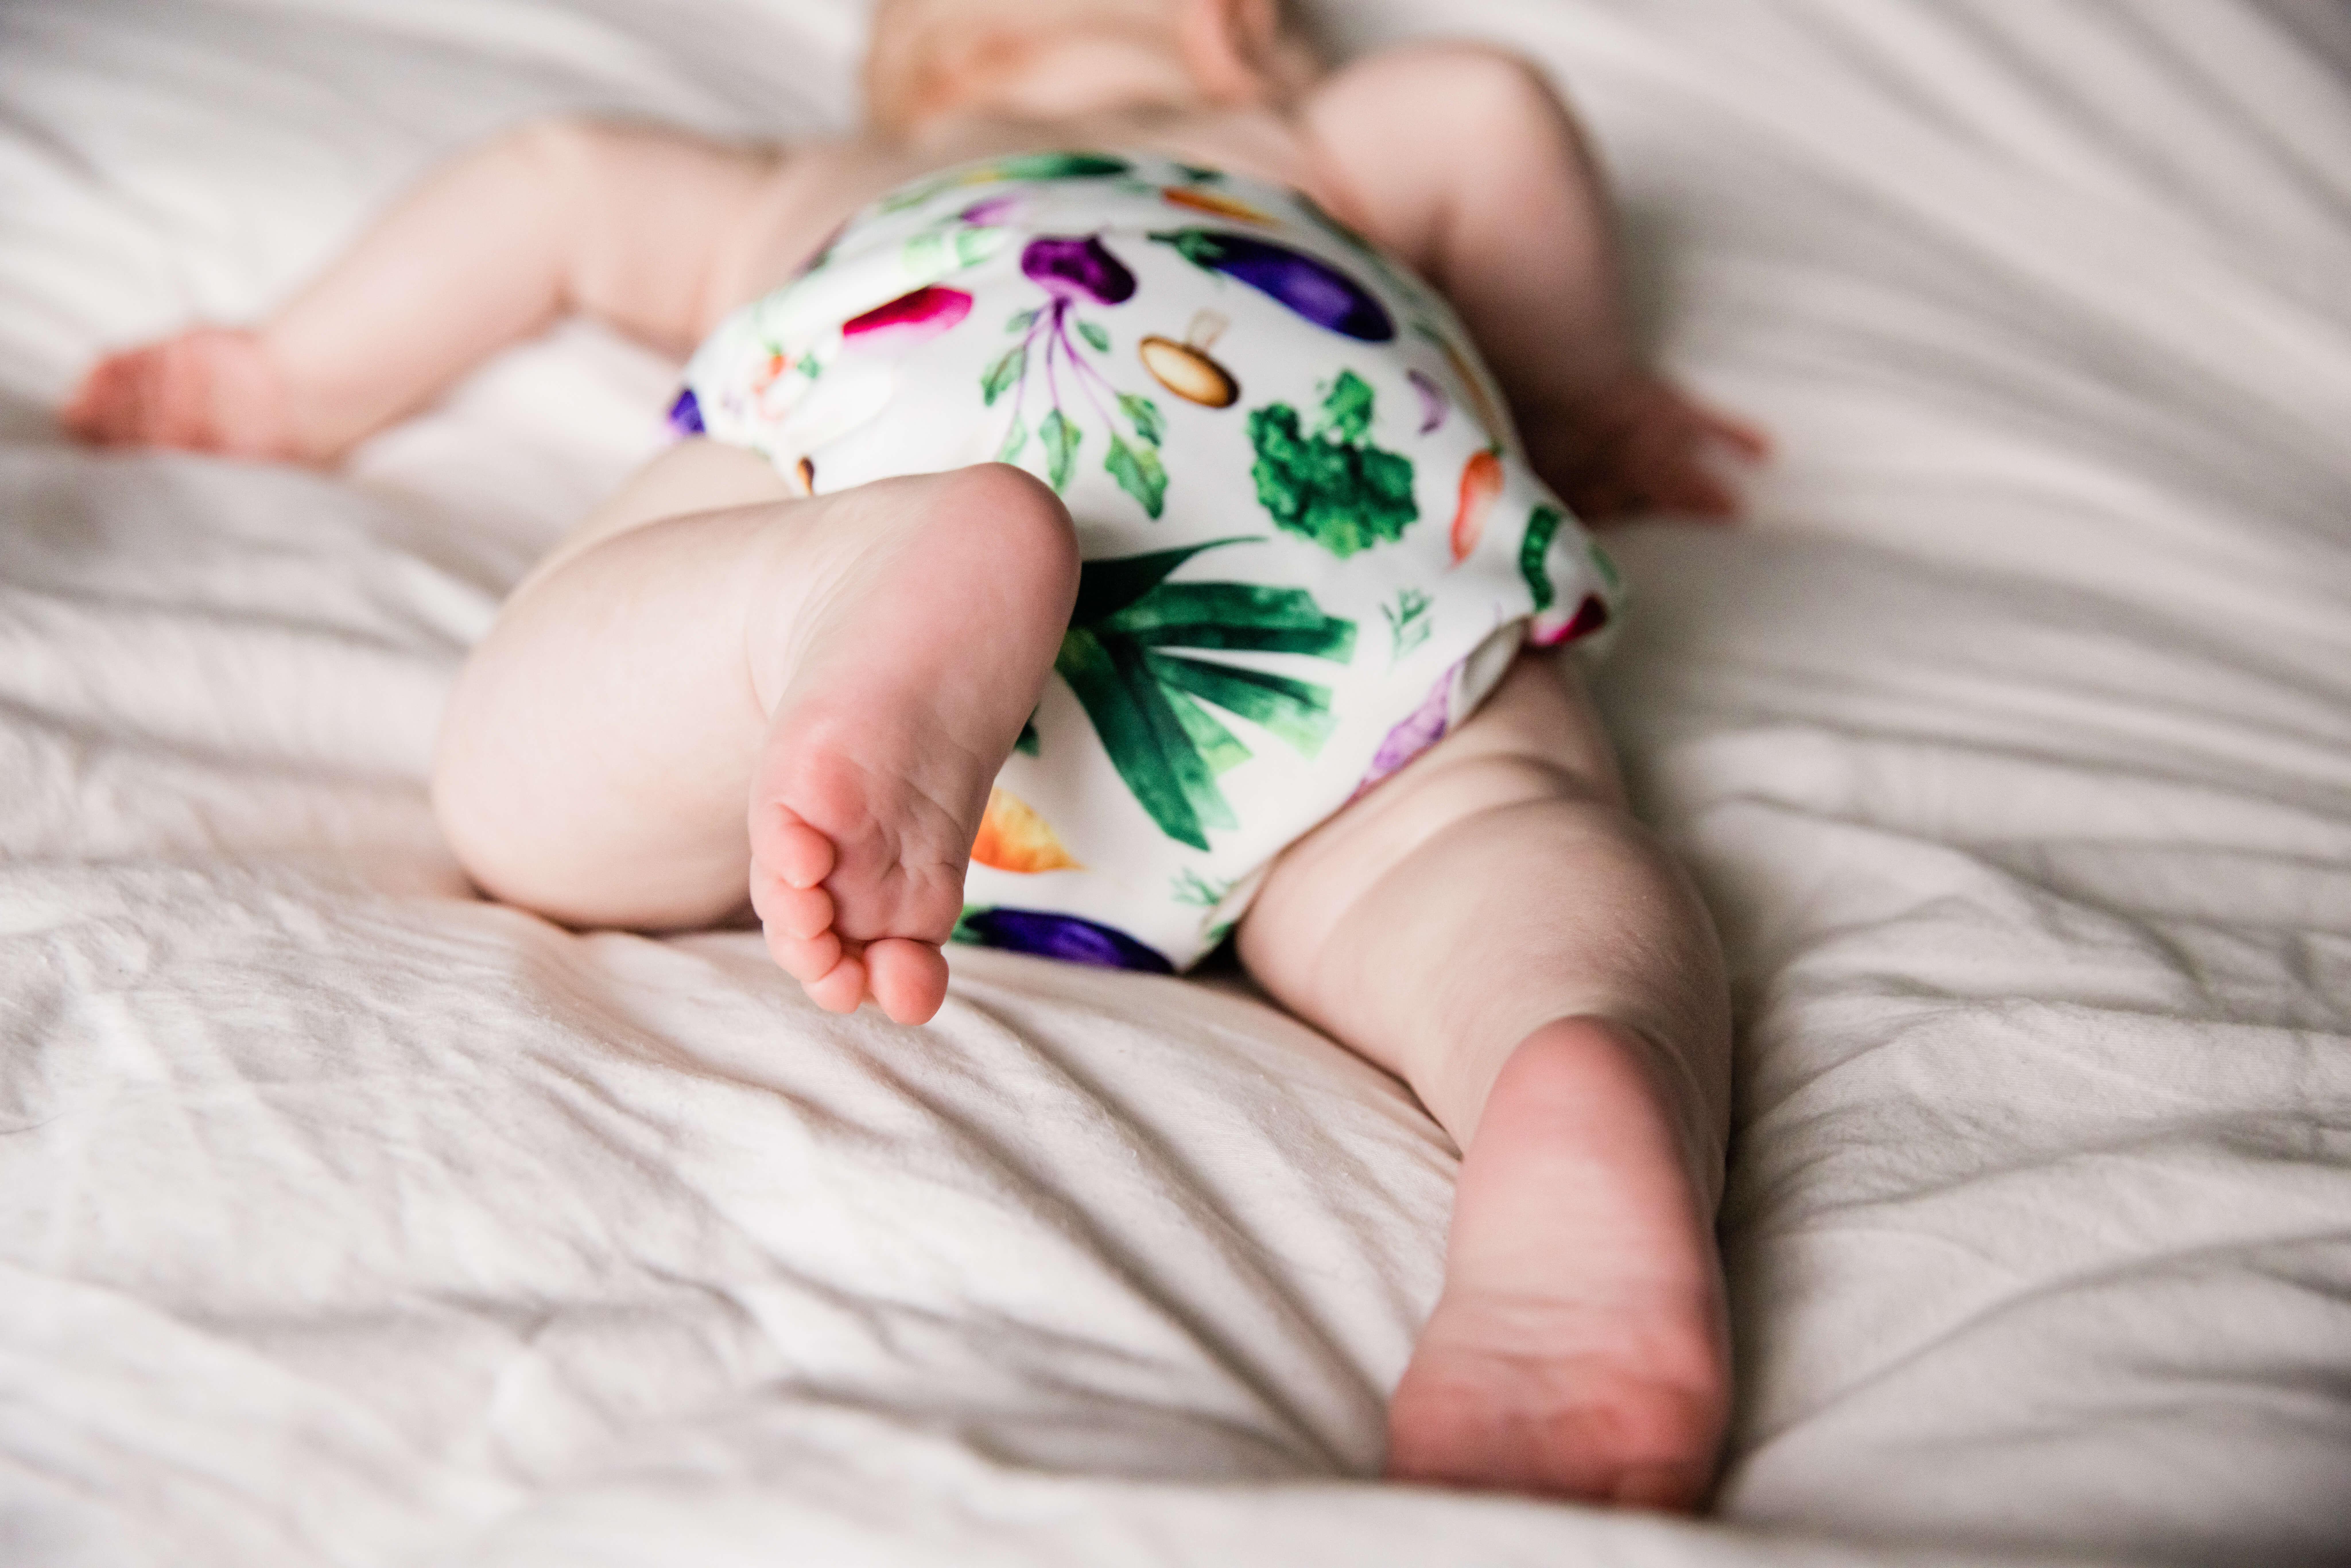 lockdown baby chubby legs kicking by Chelmsford photographer Kika Mitchell Photography